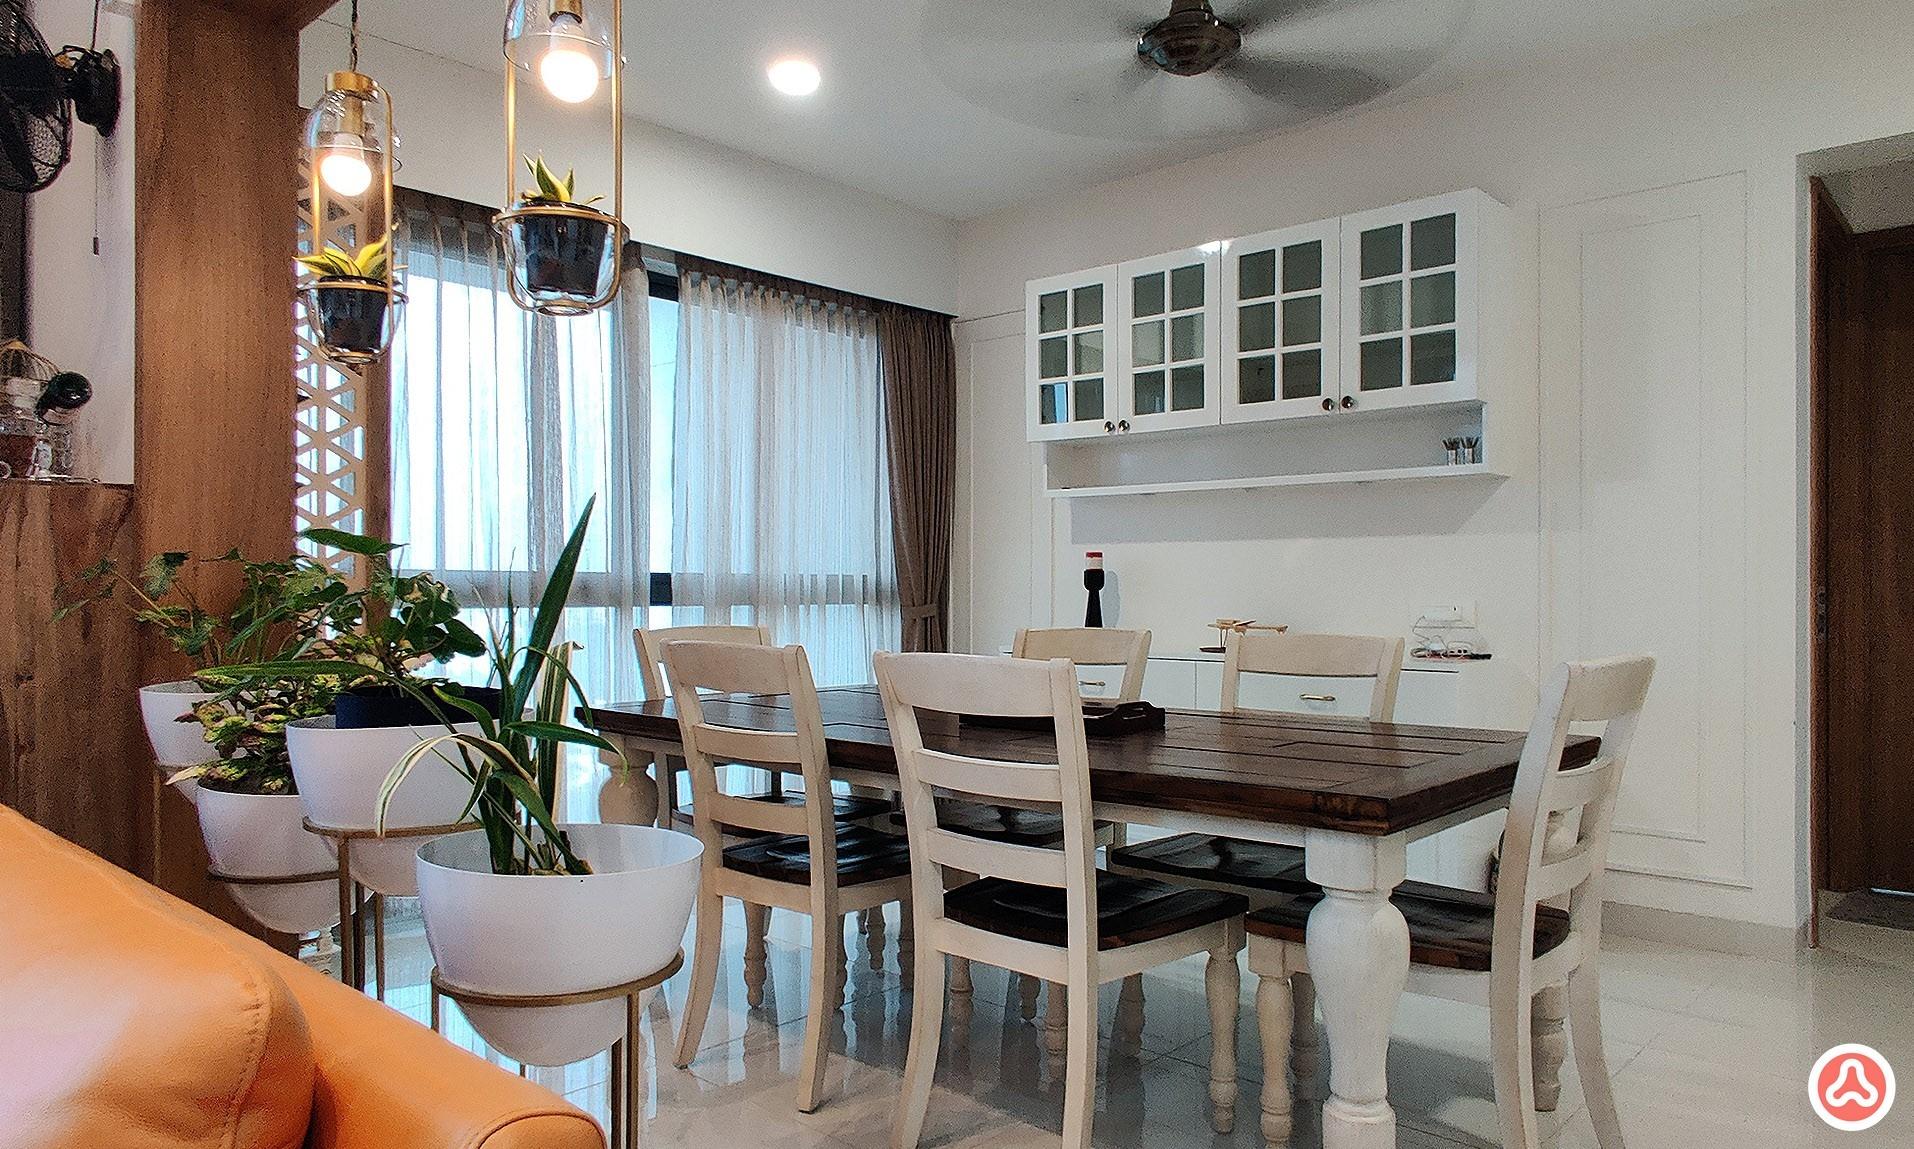 Dinging room design, design ideas for dining space